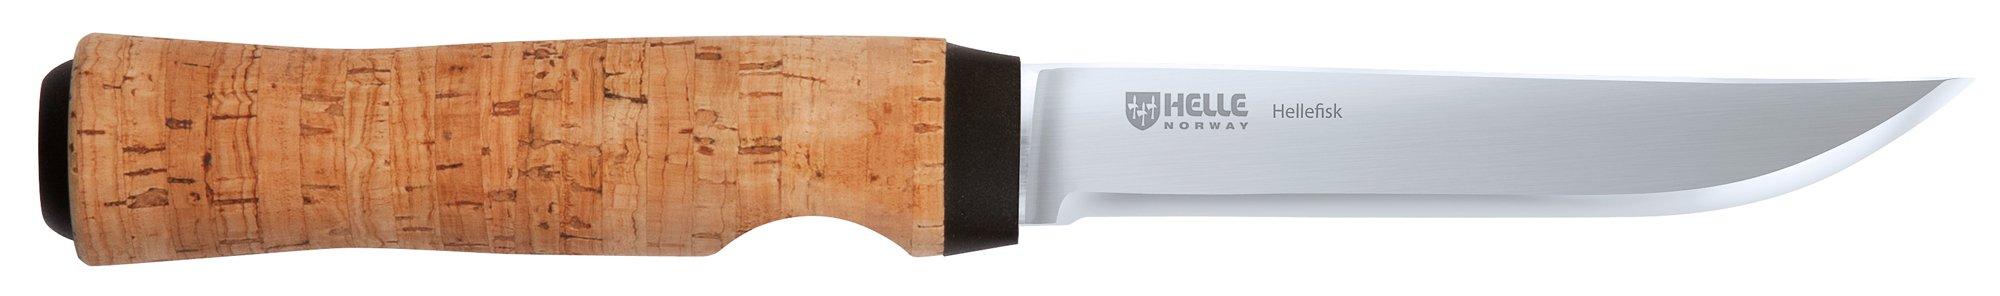 Helle Hellefisk Knife